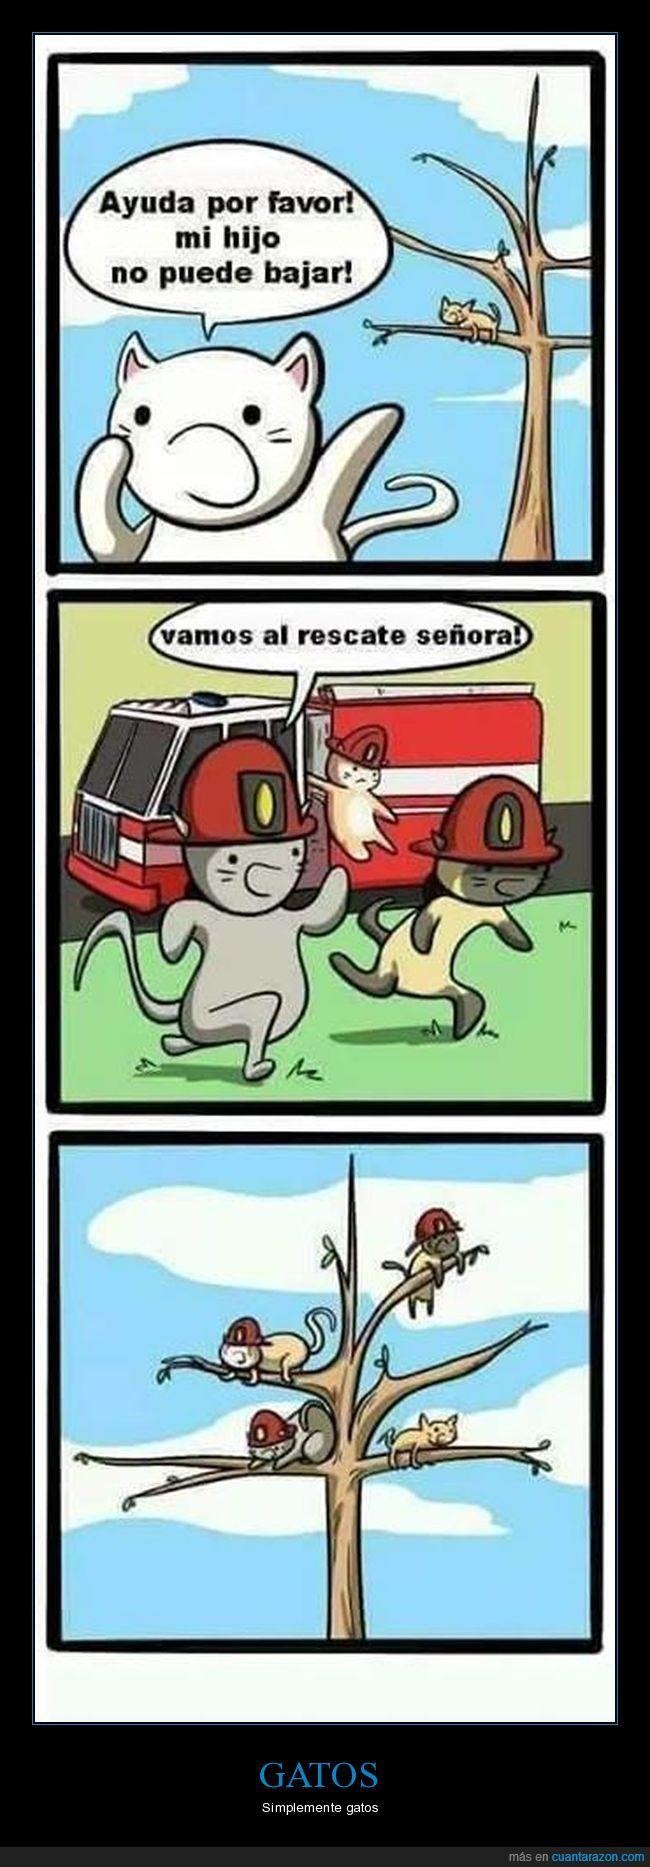 arbol,ayuda,bombero,gatos,grrr,hijo,madre,miau,rescate,rwar